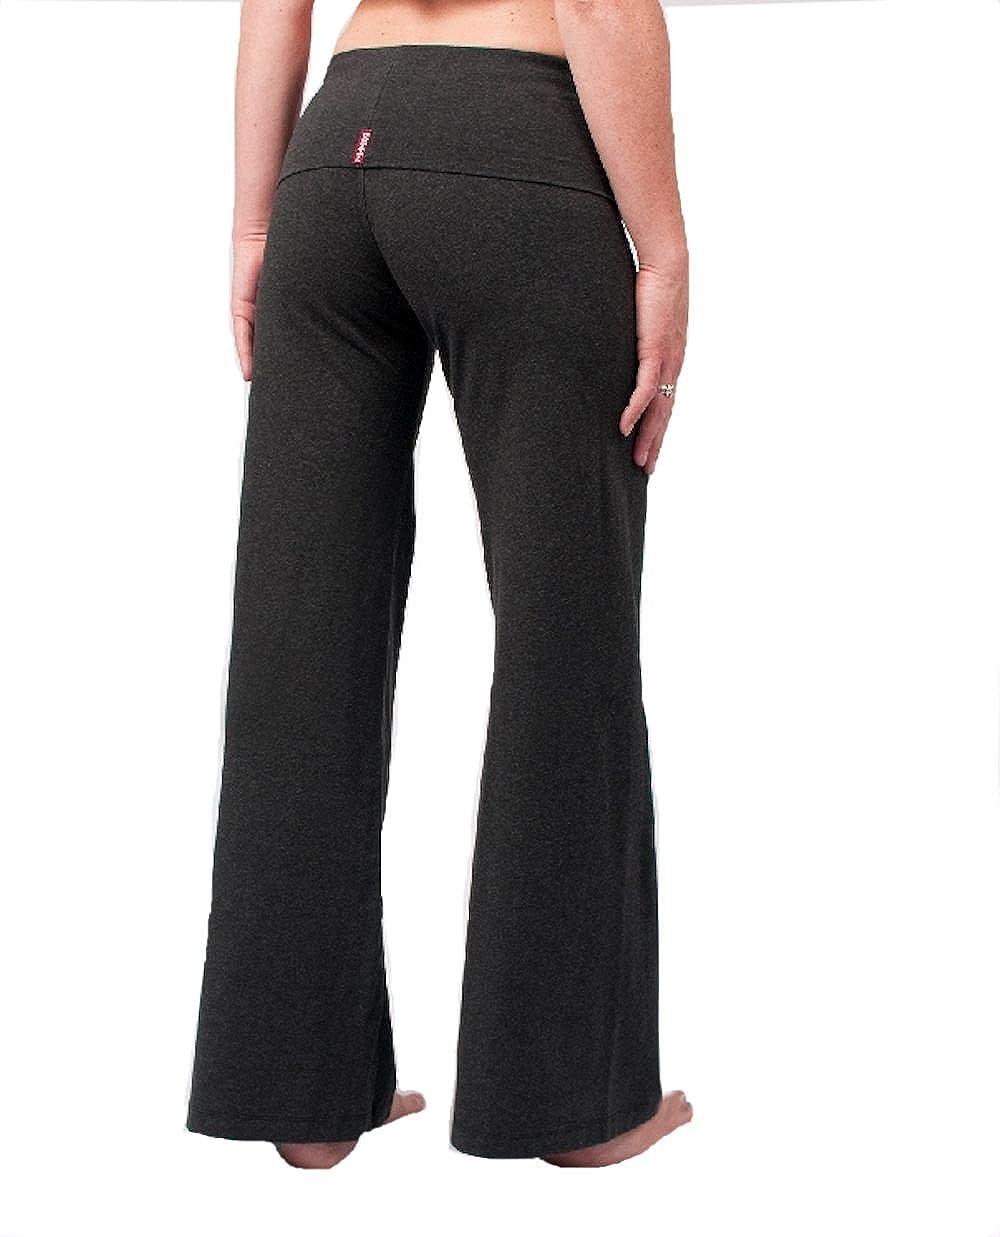 a668d9a608511 Amazon.com: Hard Tail Contour Rolldown Wide Leg Yoga Pants - Dark Charcoal:  Clothing